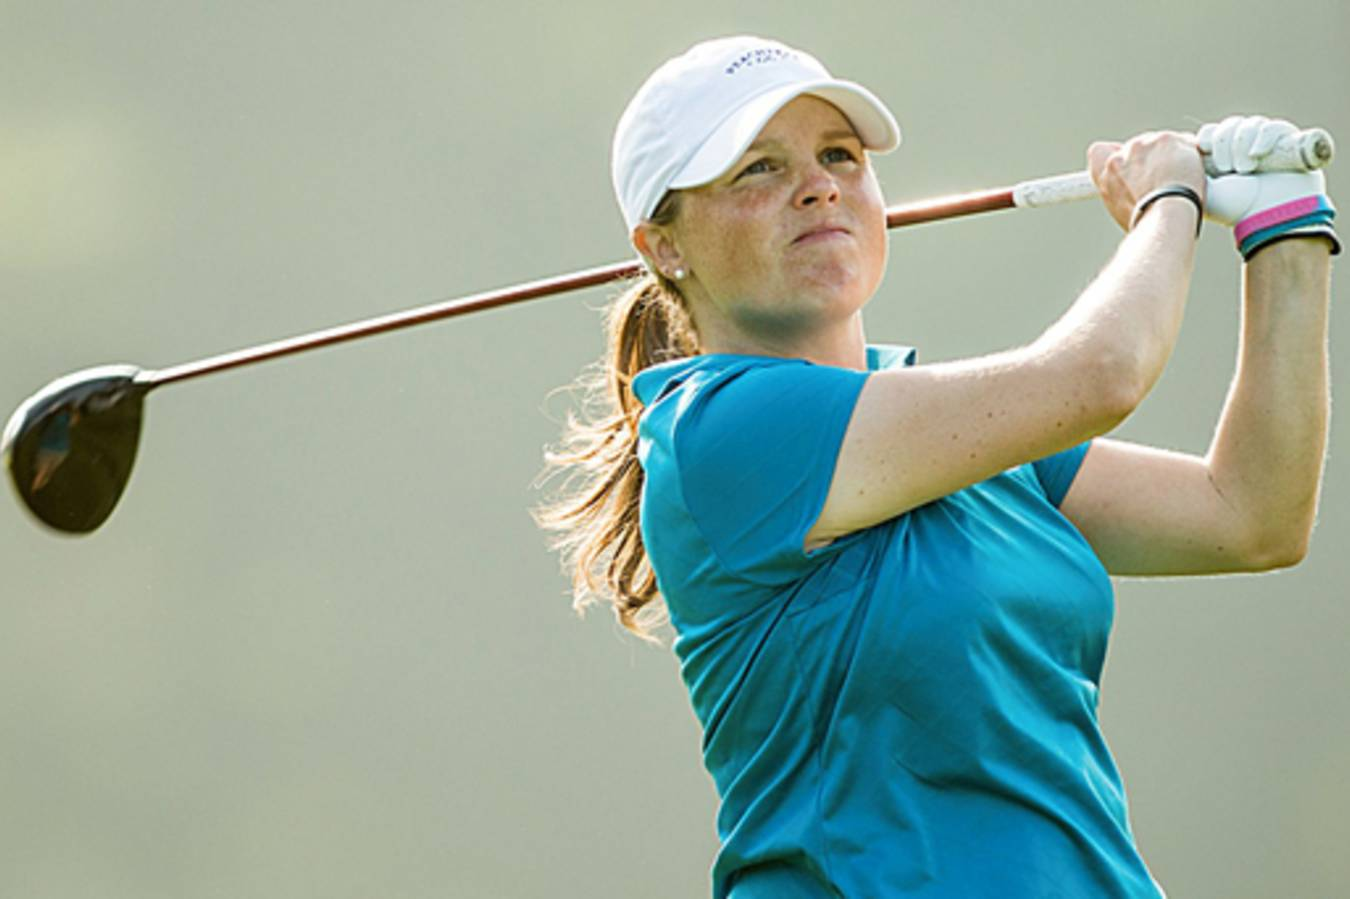 Agree Louisiana amateur golf championship 09